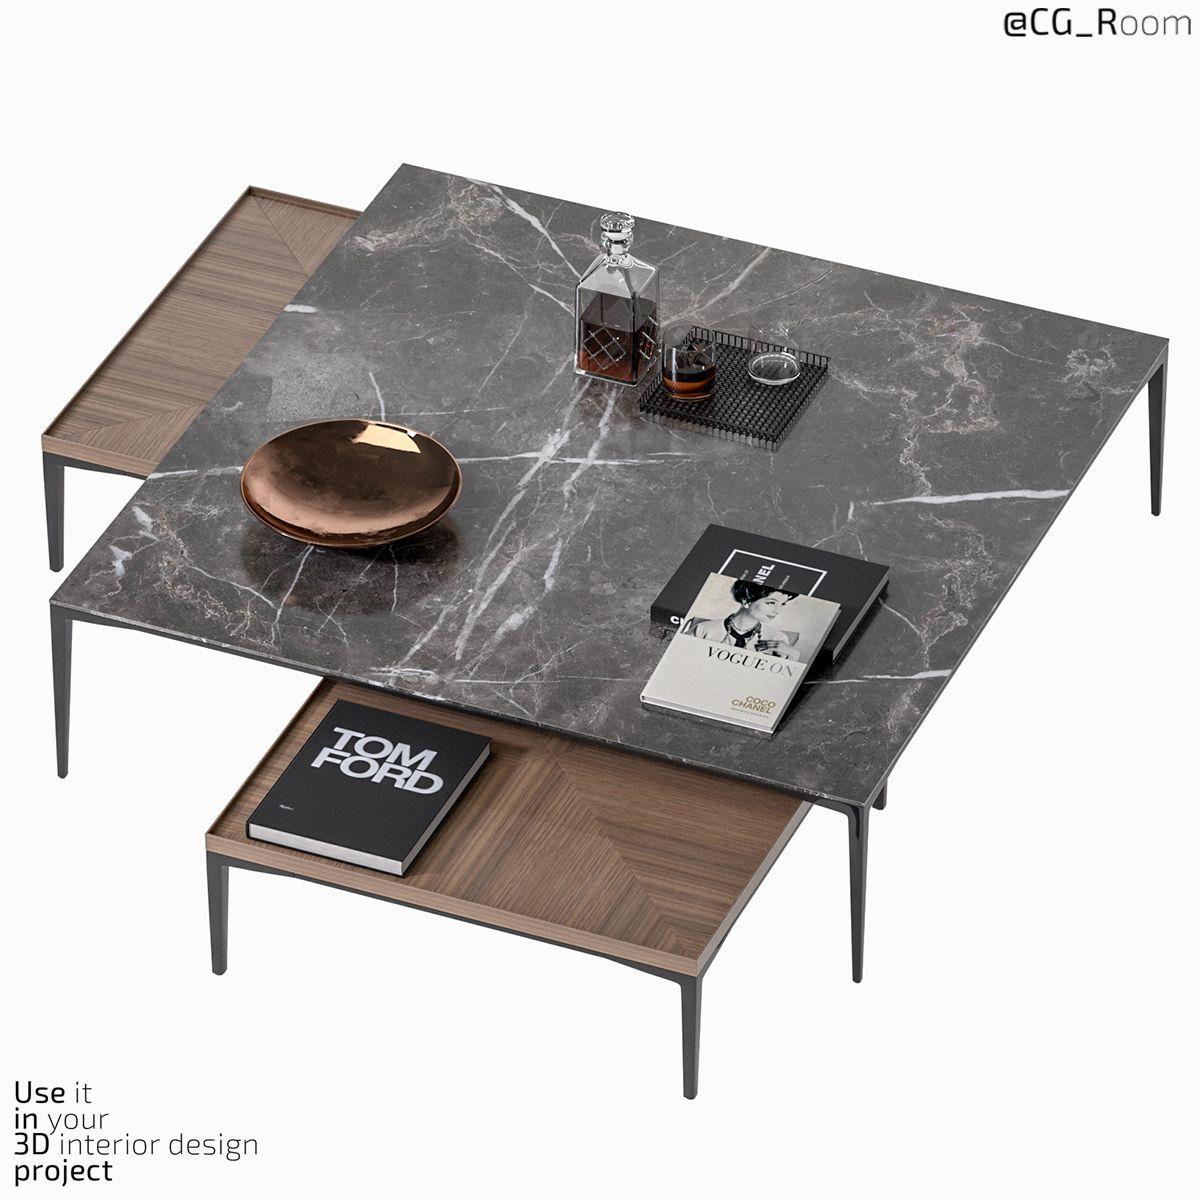 Coffee Table Tray Rimadesio Coffee Table Coffee Table Wood Coffee Table Tray [ 1200 x 1200 Pixel ]